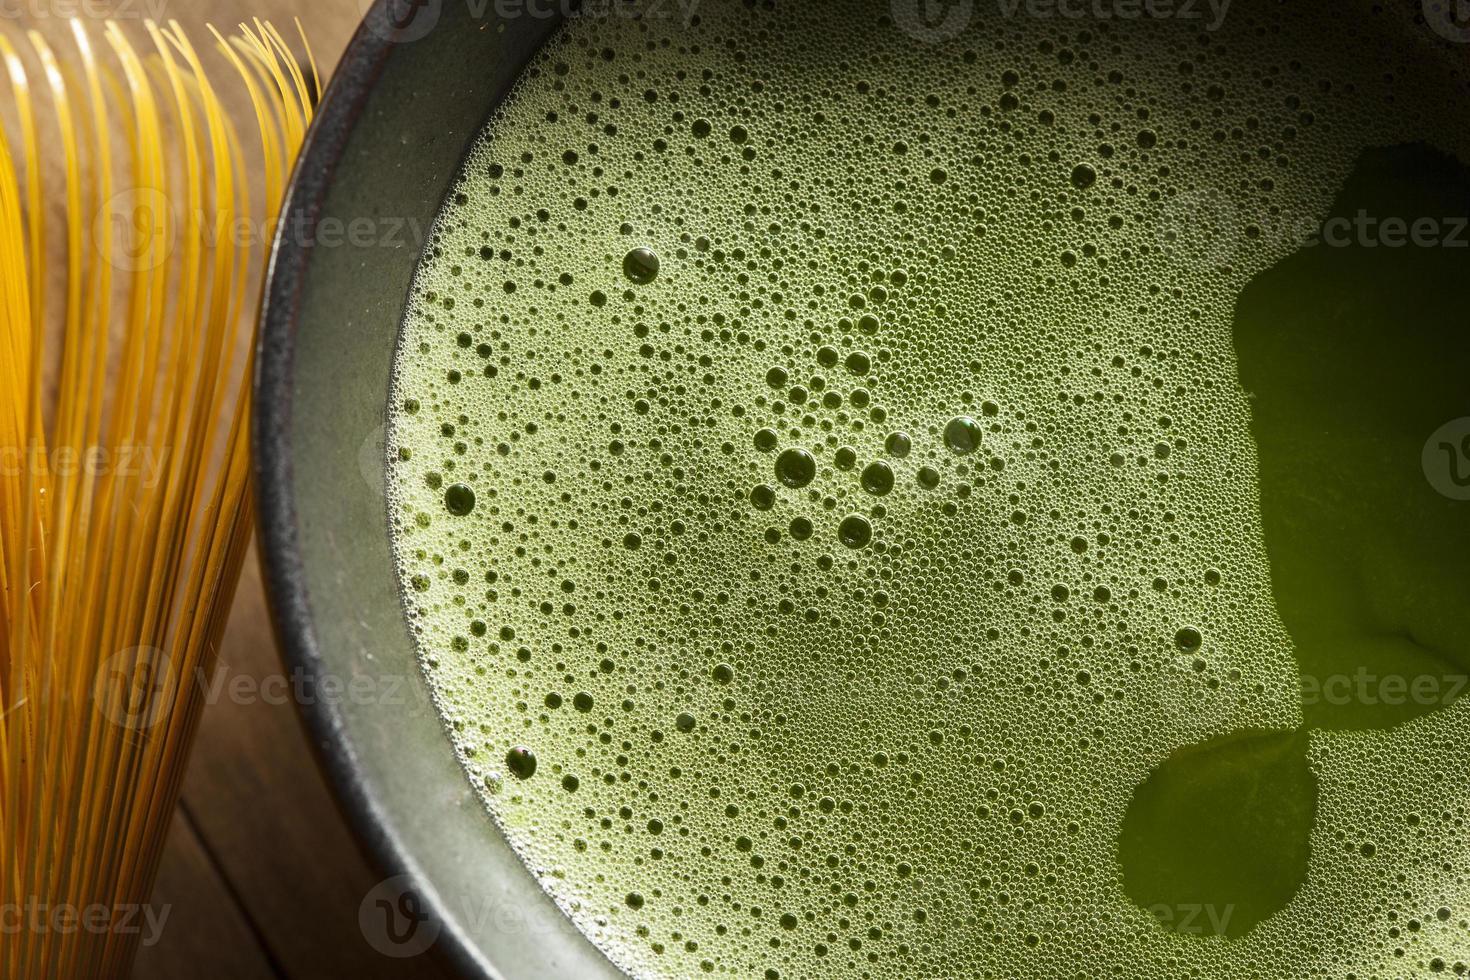 Organic Green Matcha Tea photo